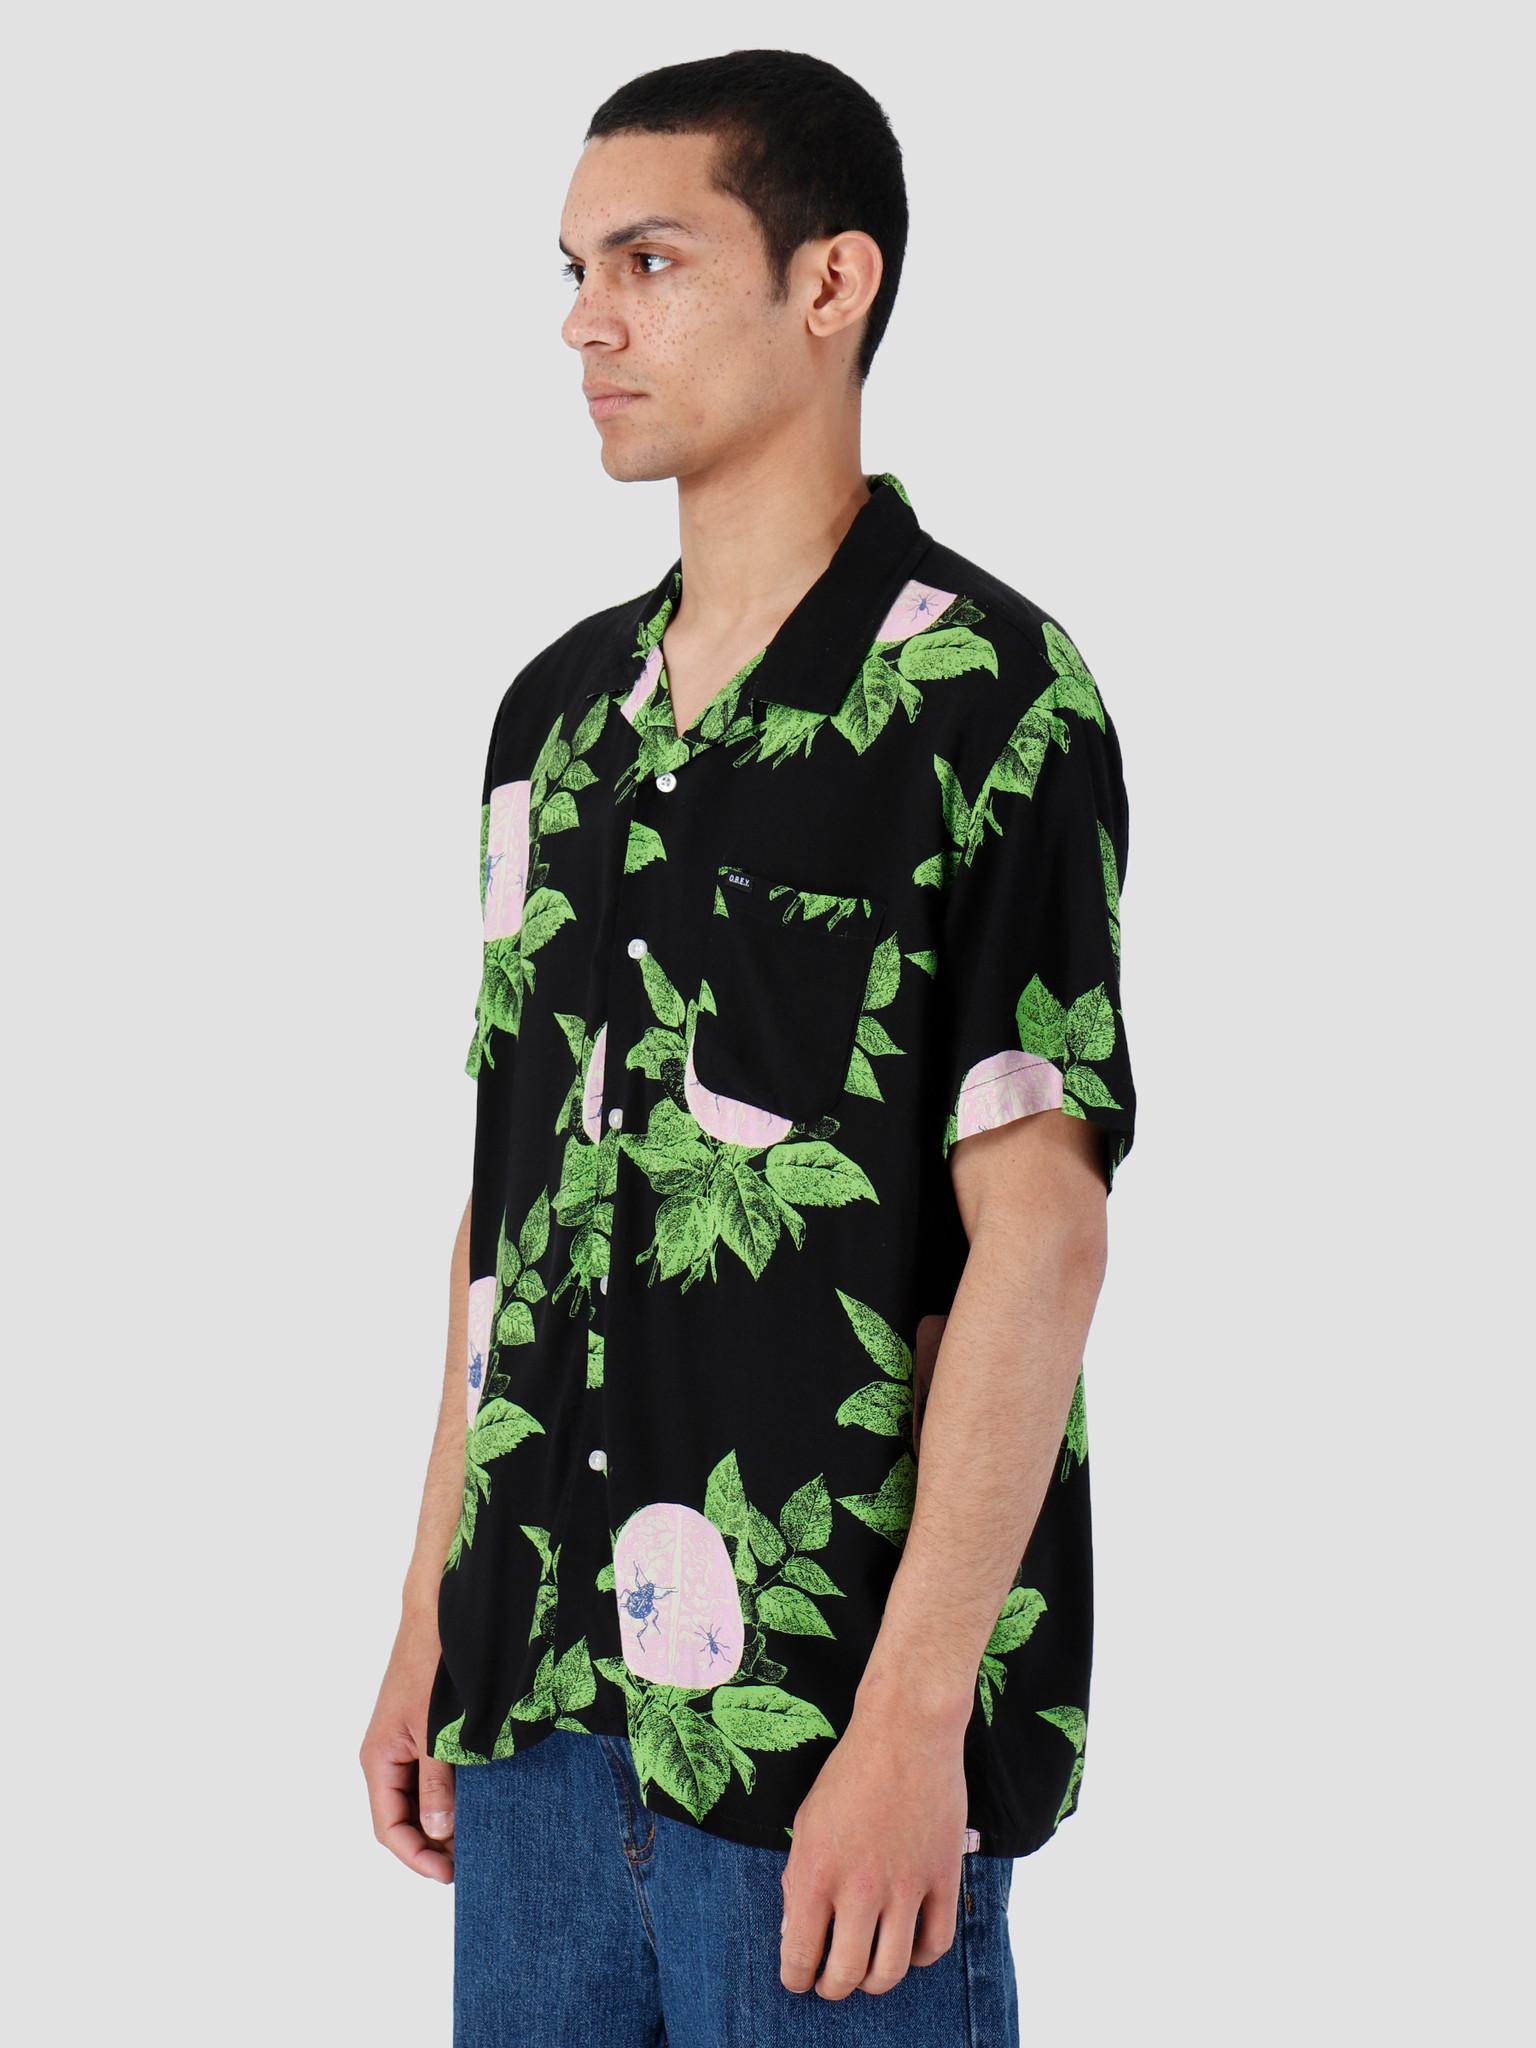 Obey Obey Brainiac Woven T-Shirt Black Multi 181210248-BKM